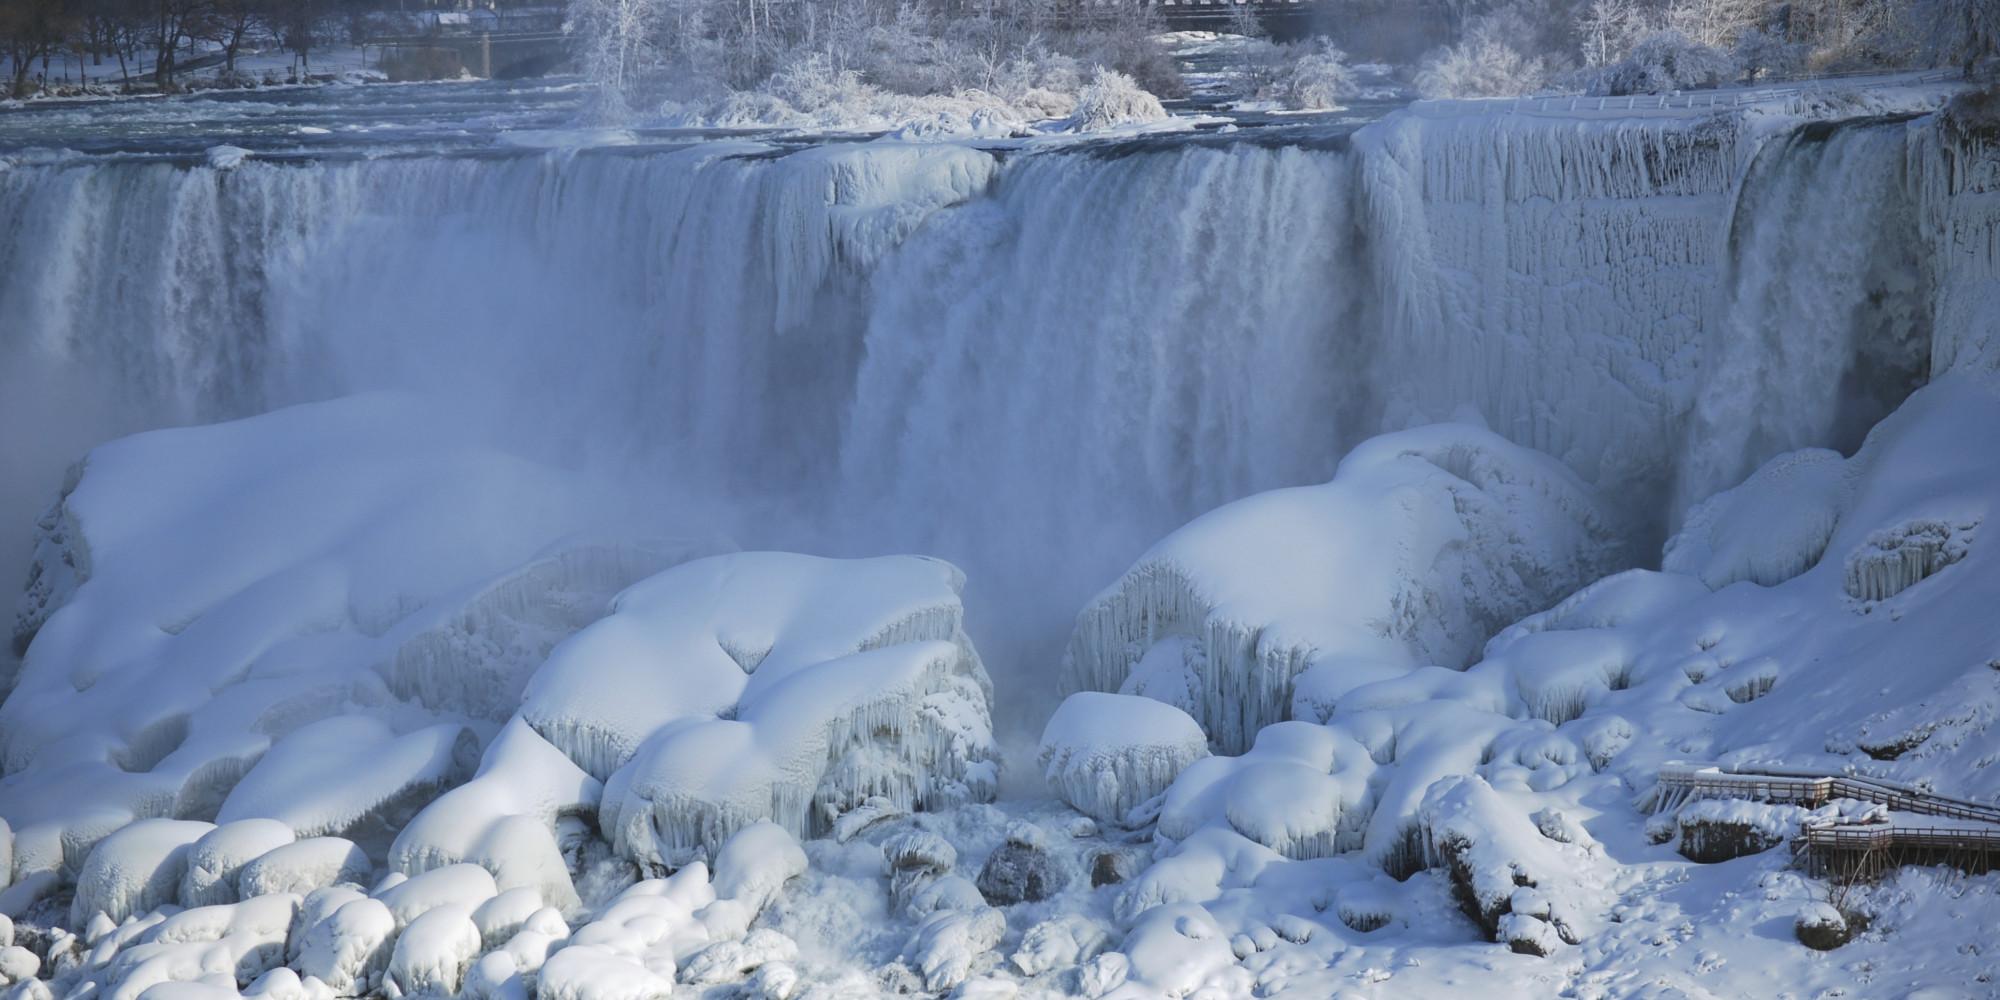 15 Stunning Photos Of Frozen Niagara Falls 3 Nights In